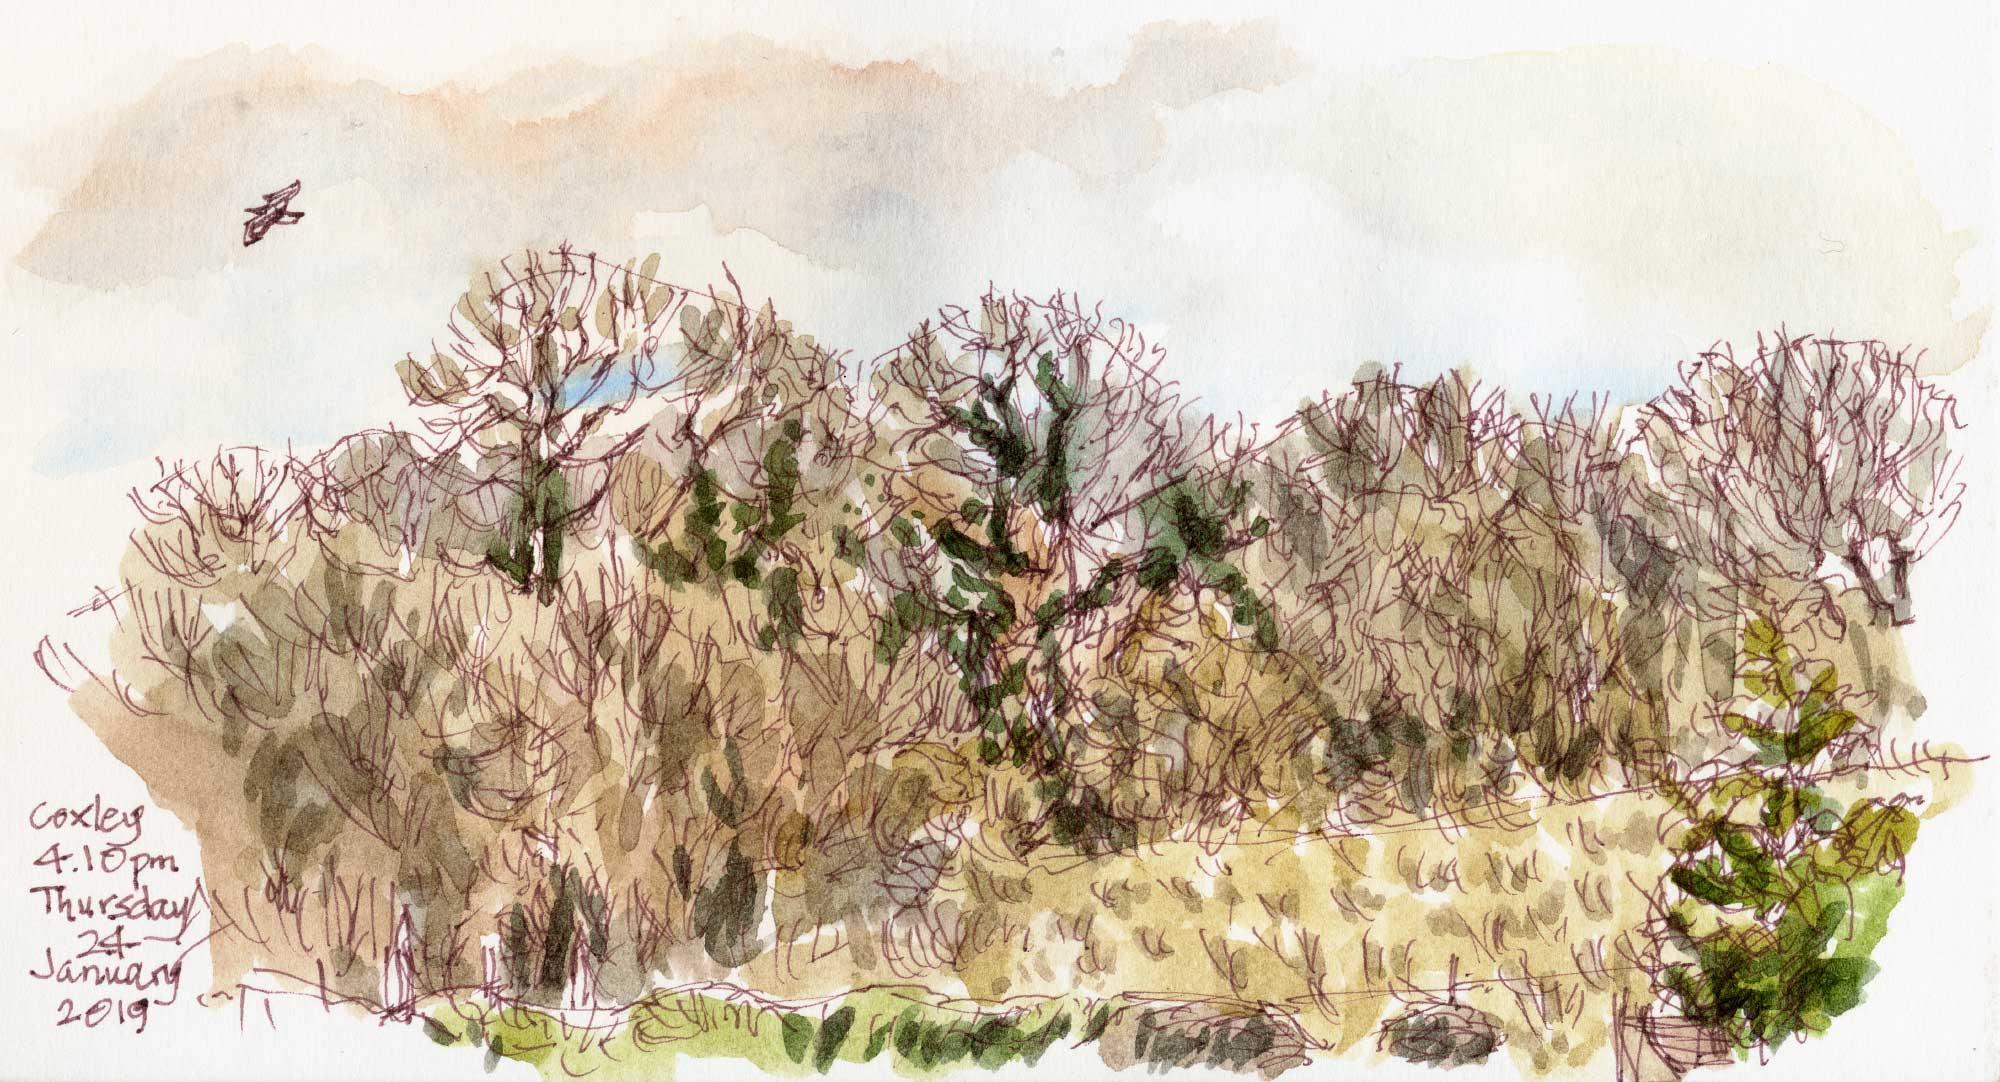 Coxley Wood